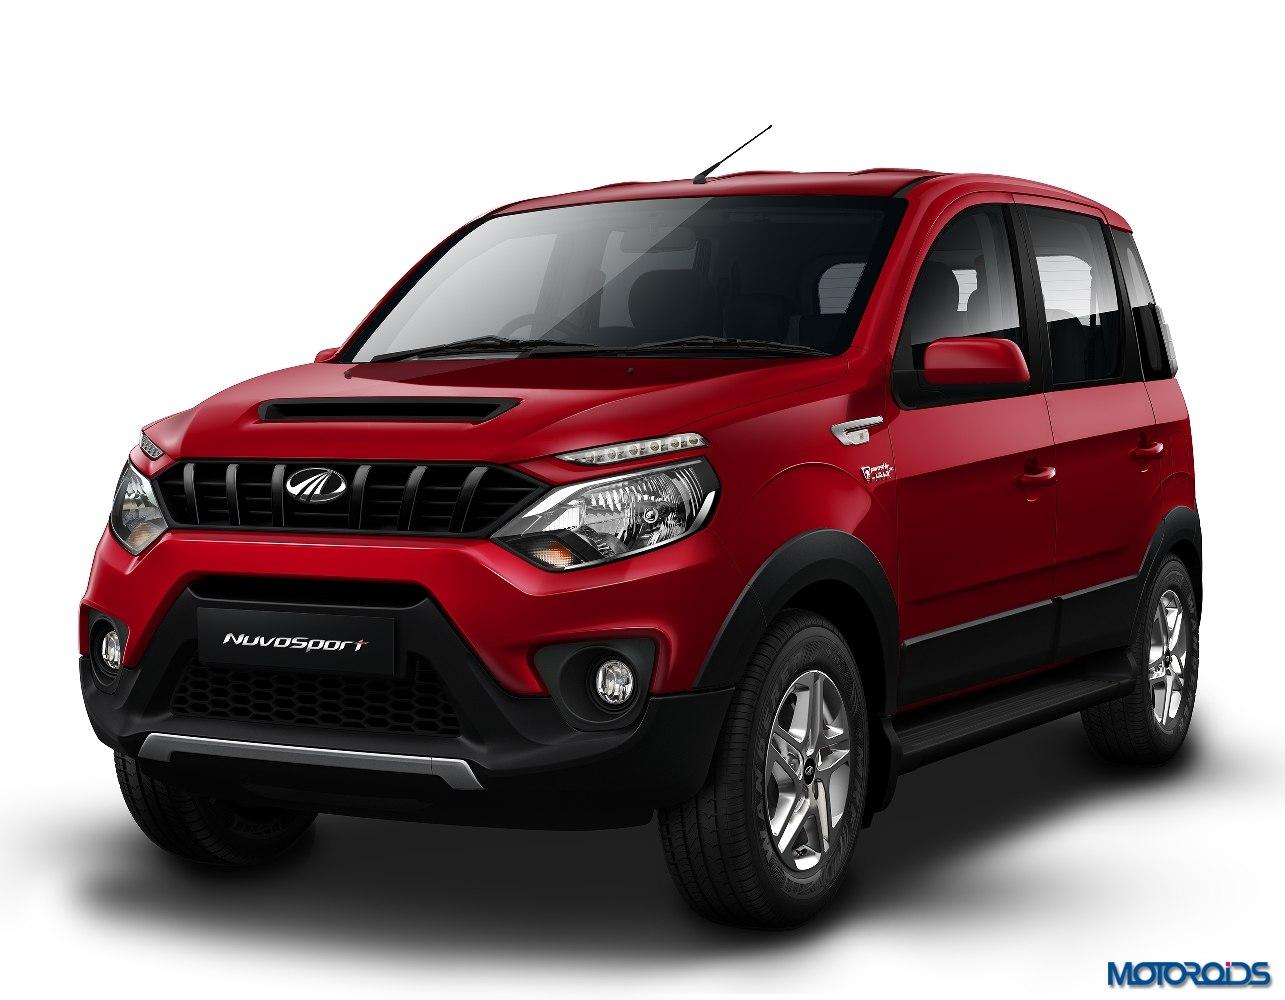 Mahindra Nuvosport SUV front